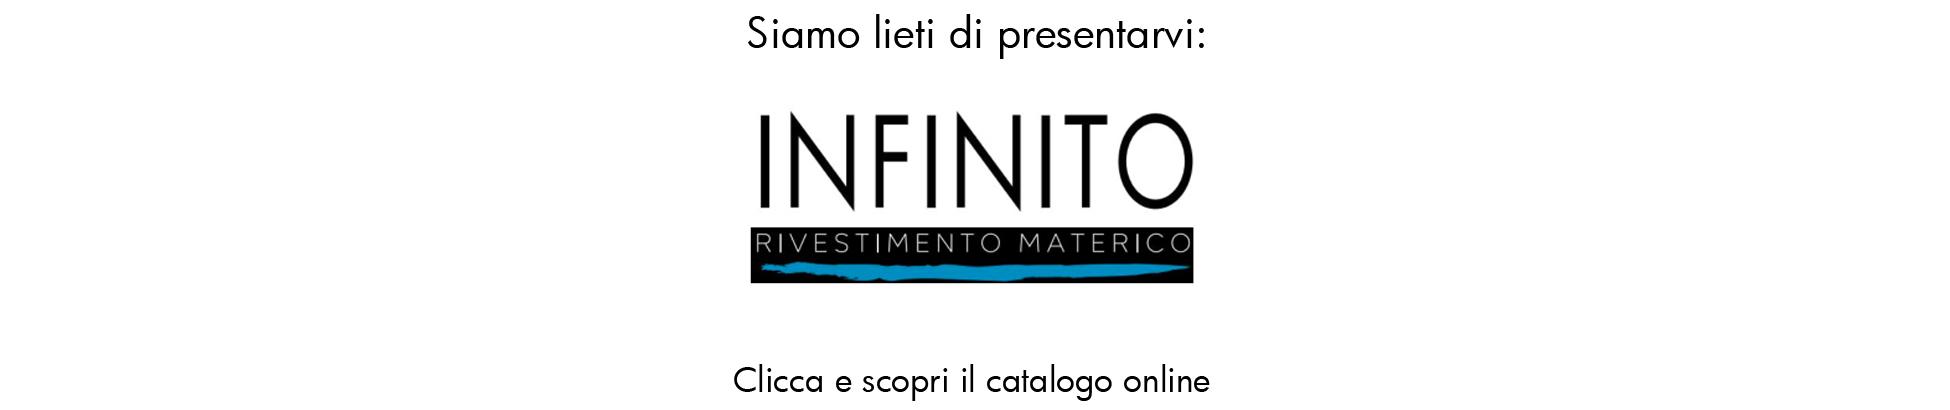 Slide-infinito-410-1